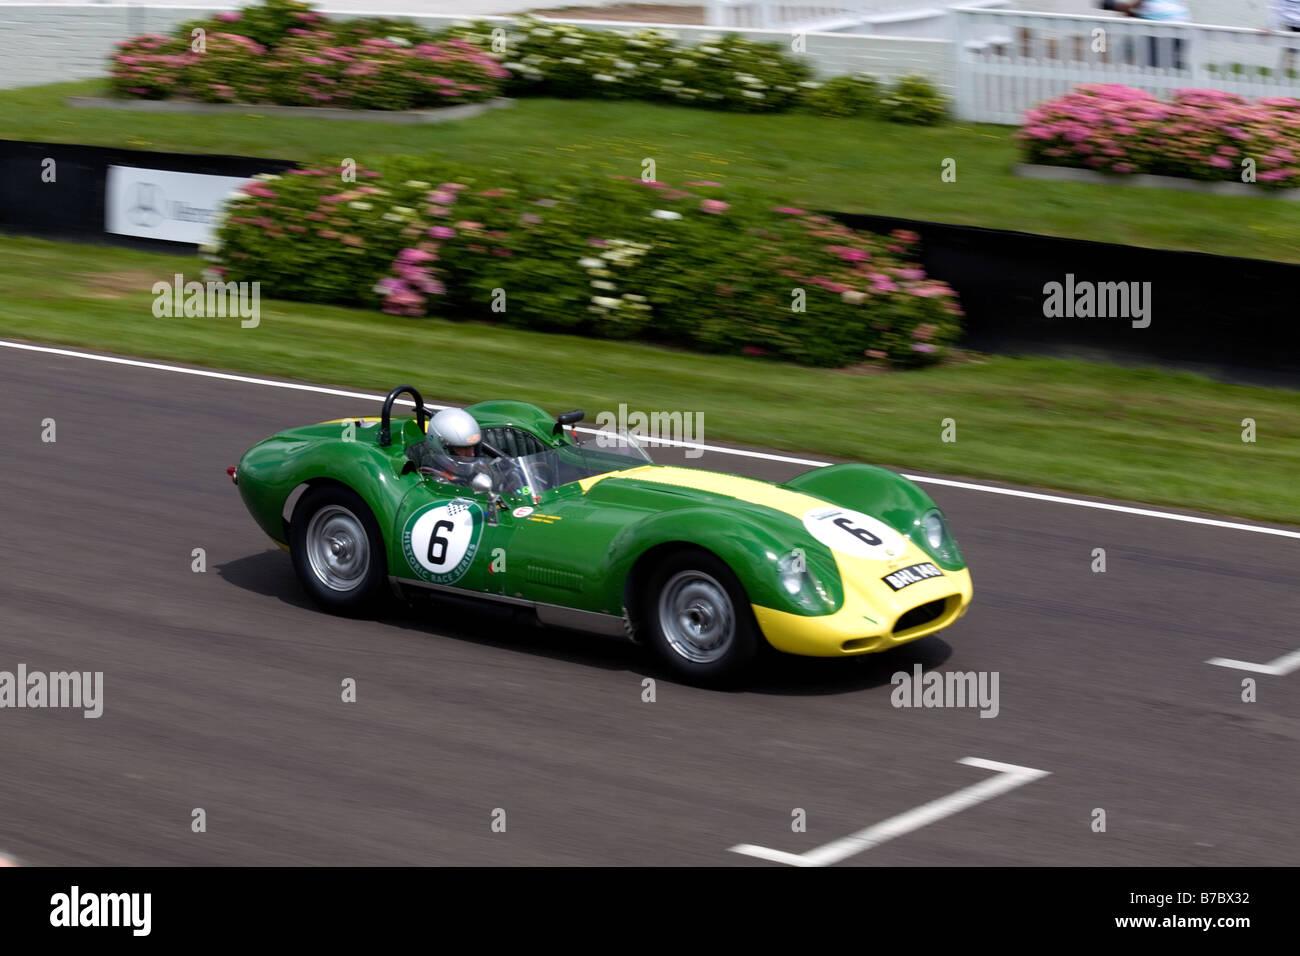 Vintage Jaguar Racing Car